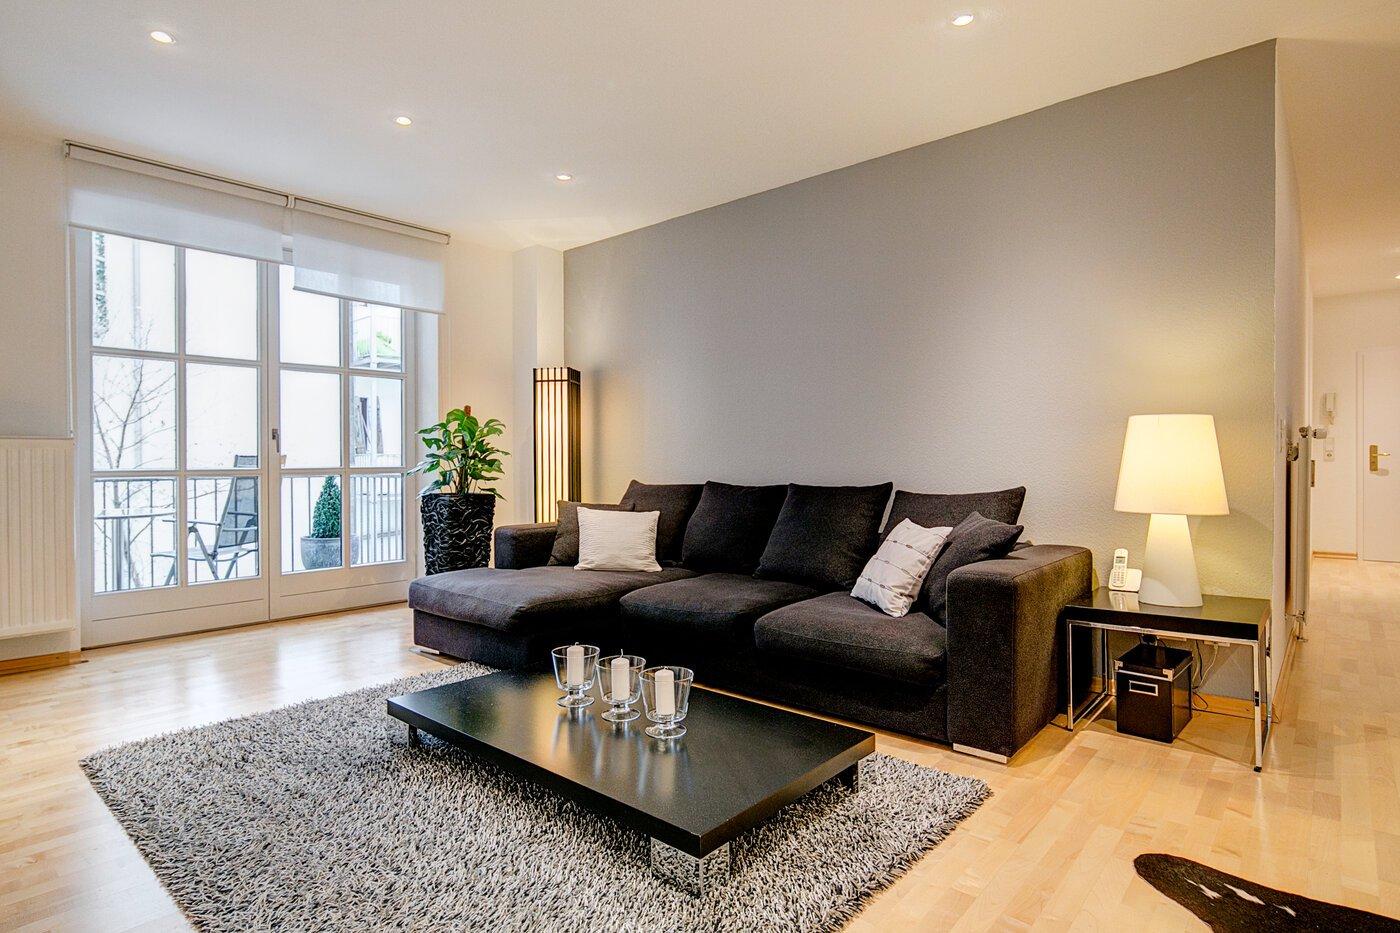 2 zimmer wohnung m bliert balkon m nchen altstadt 4361. Black Bedroom Furniture Sets. Home Design Ideas